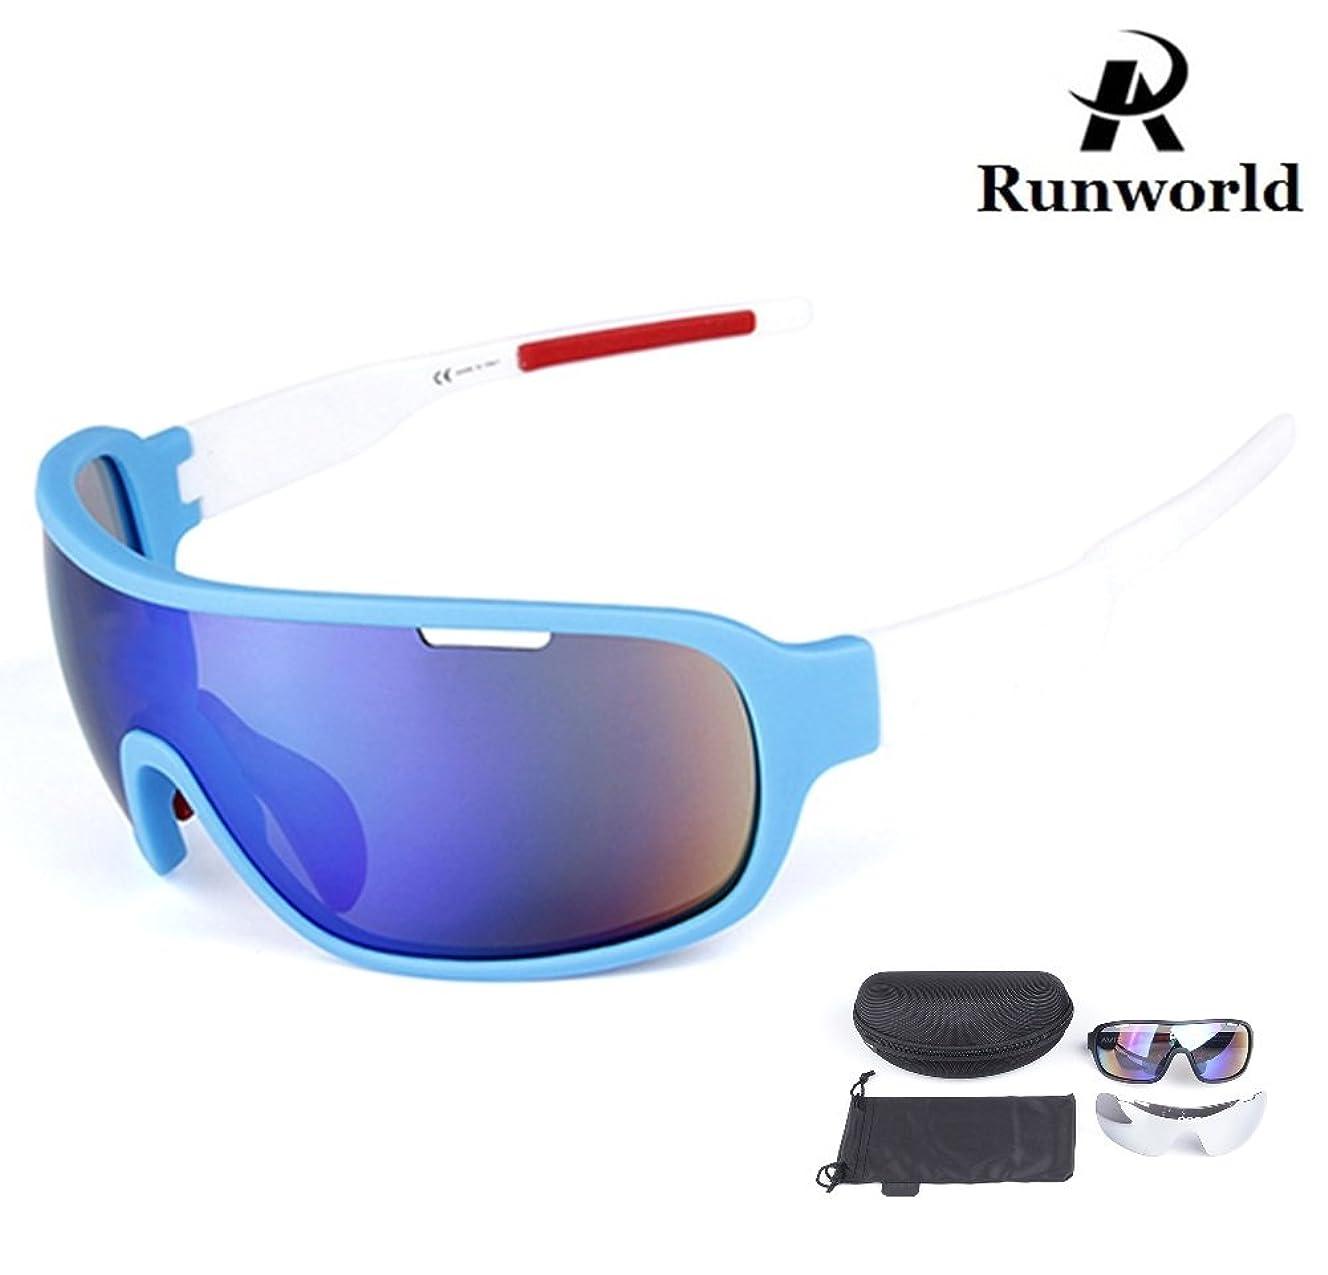 Runworld Polarized Sports Cycling Sunglasses Bike Glasses for Men Women Running Driving Fishing Golf Baseball Racing Ski Goggles